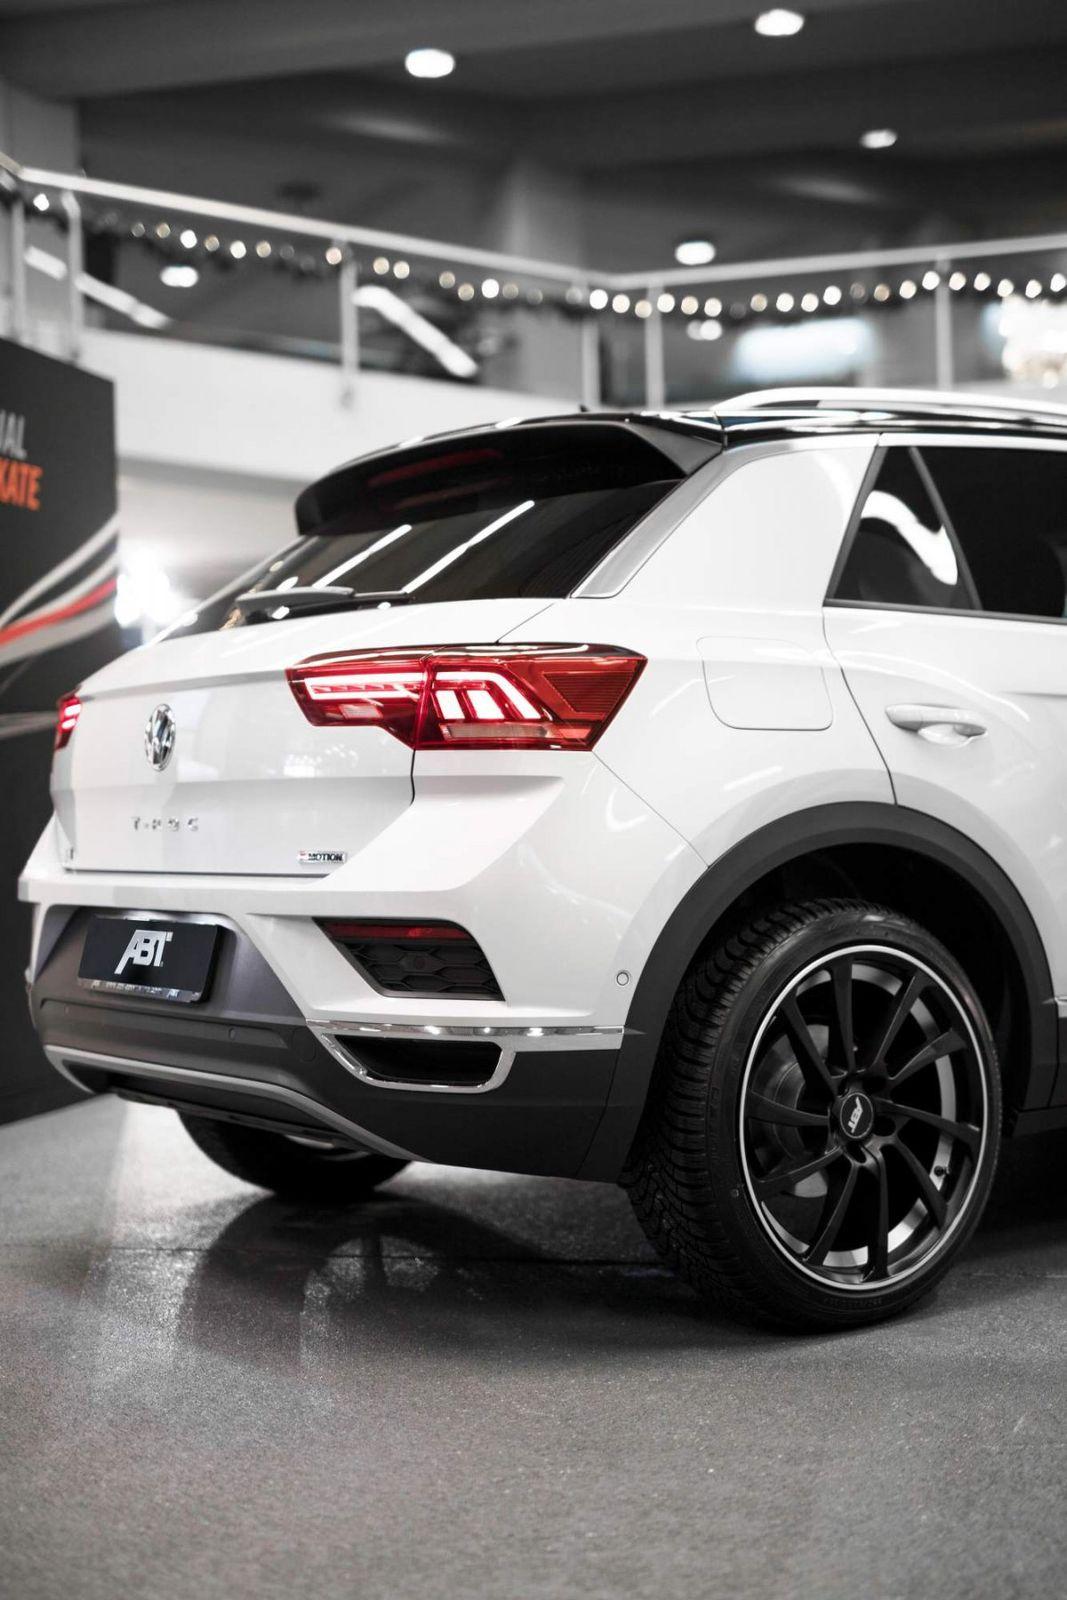 roc abt vw volkswagen autoblog gti maakt oppepper kreeg flinke deze models between rock upgrades reveal styling including unveiled tuned